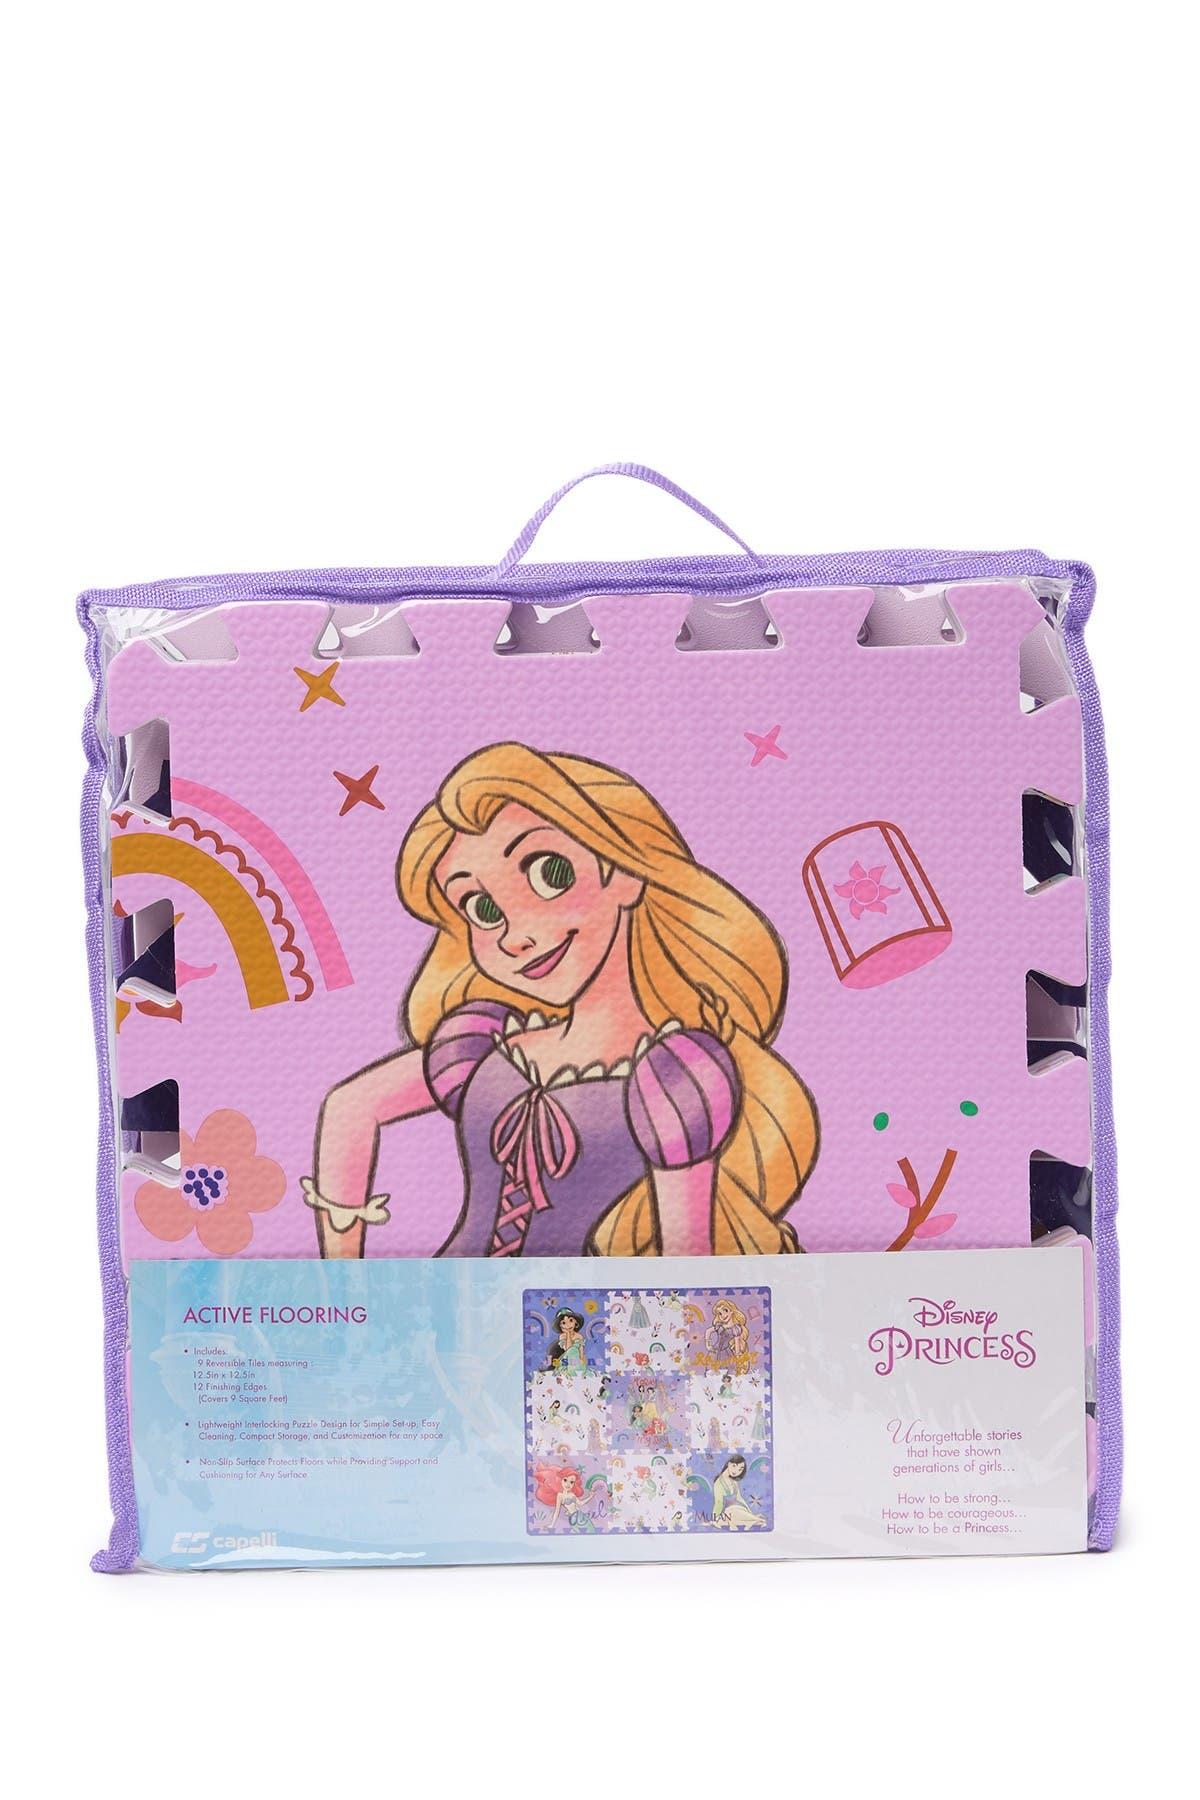 Puzzle Floor Mat Disney Princess Covers 9 Square Feet 9 Tiles